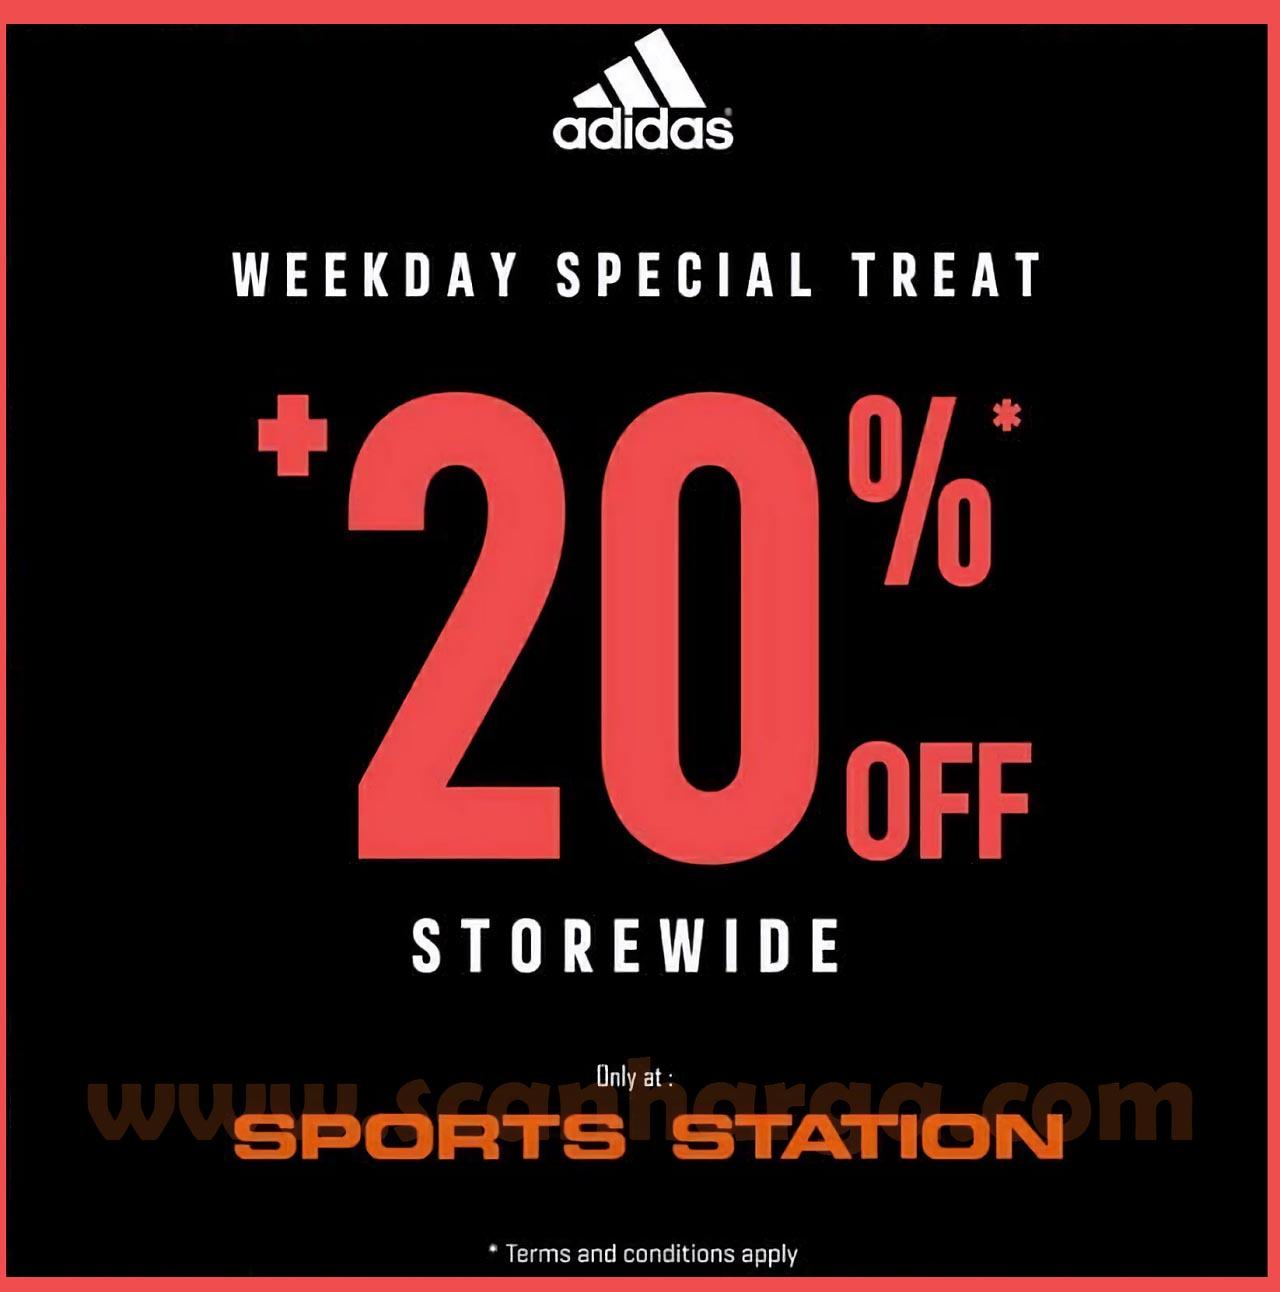 Sports Station Weekday Special Treat Promo khusus pembelian Sepatu Adidas